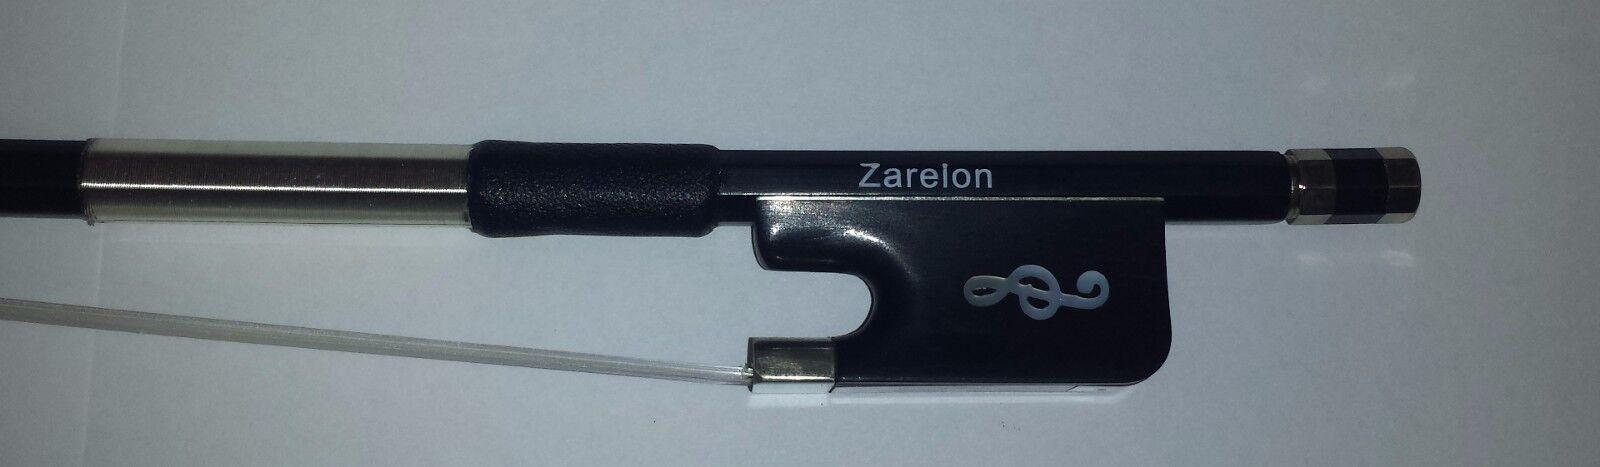 4 4 artista    clave sol  de fibra de carbono púrpura arco con zarelon Irrompible Arco para Cabello  promociones de equipo